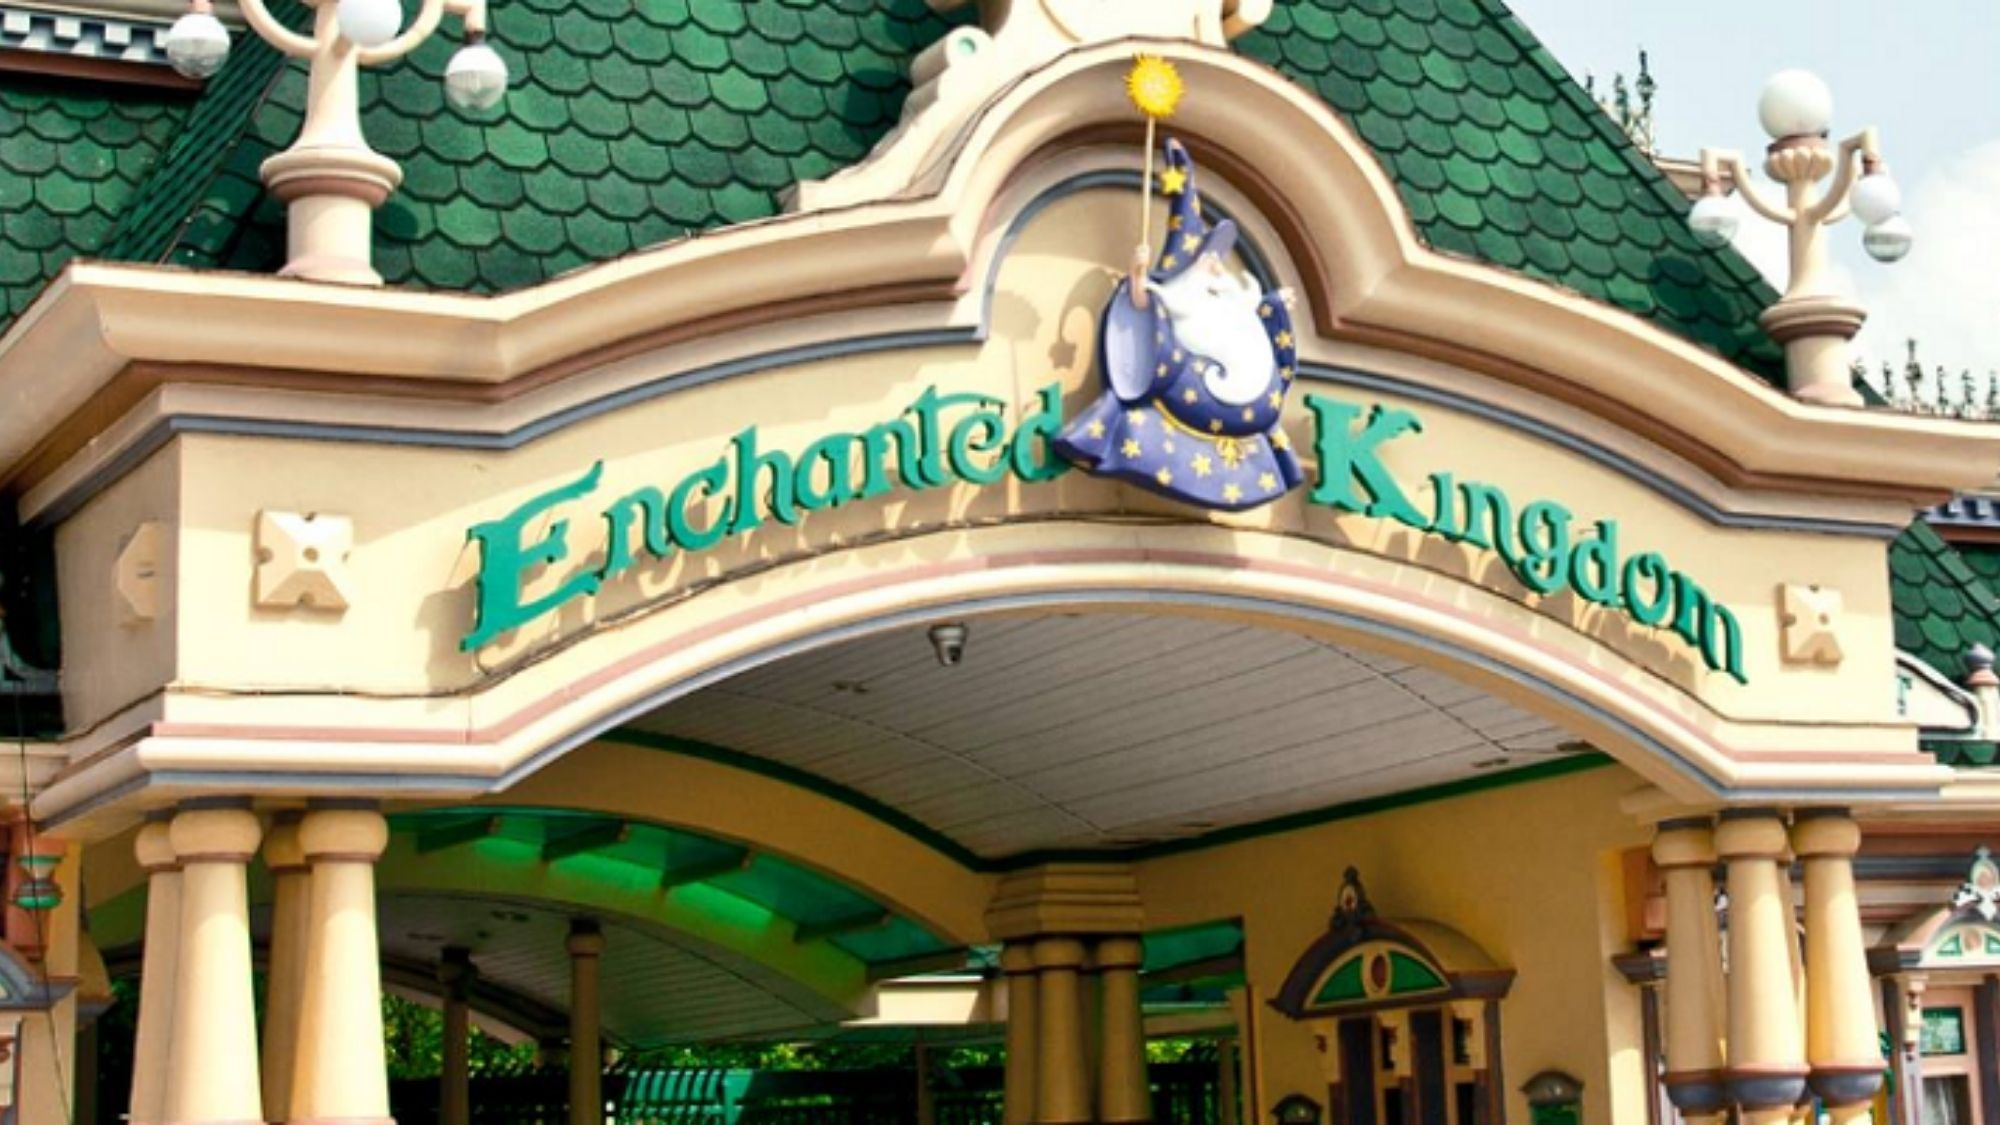 Enchanted Kingdom closed again until June 30